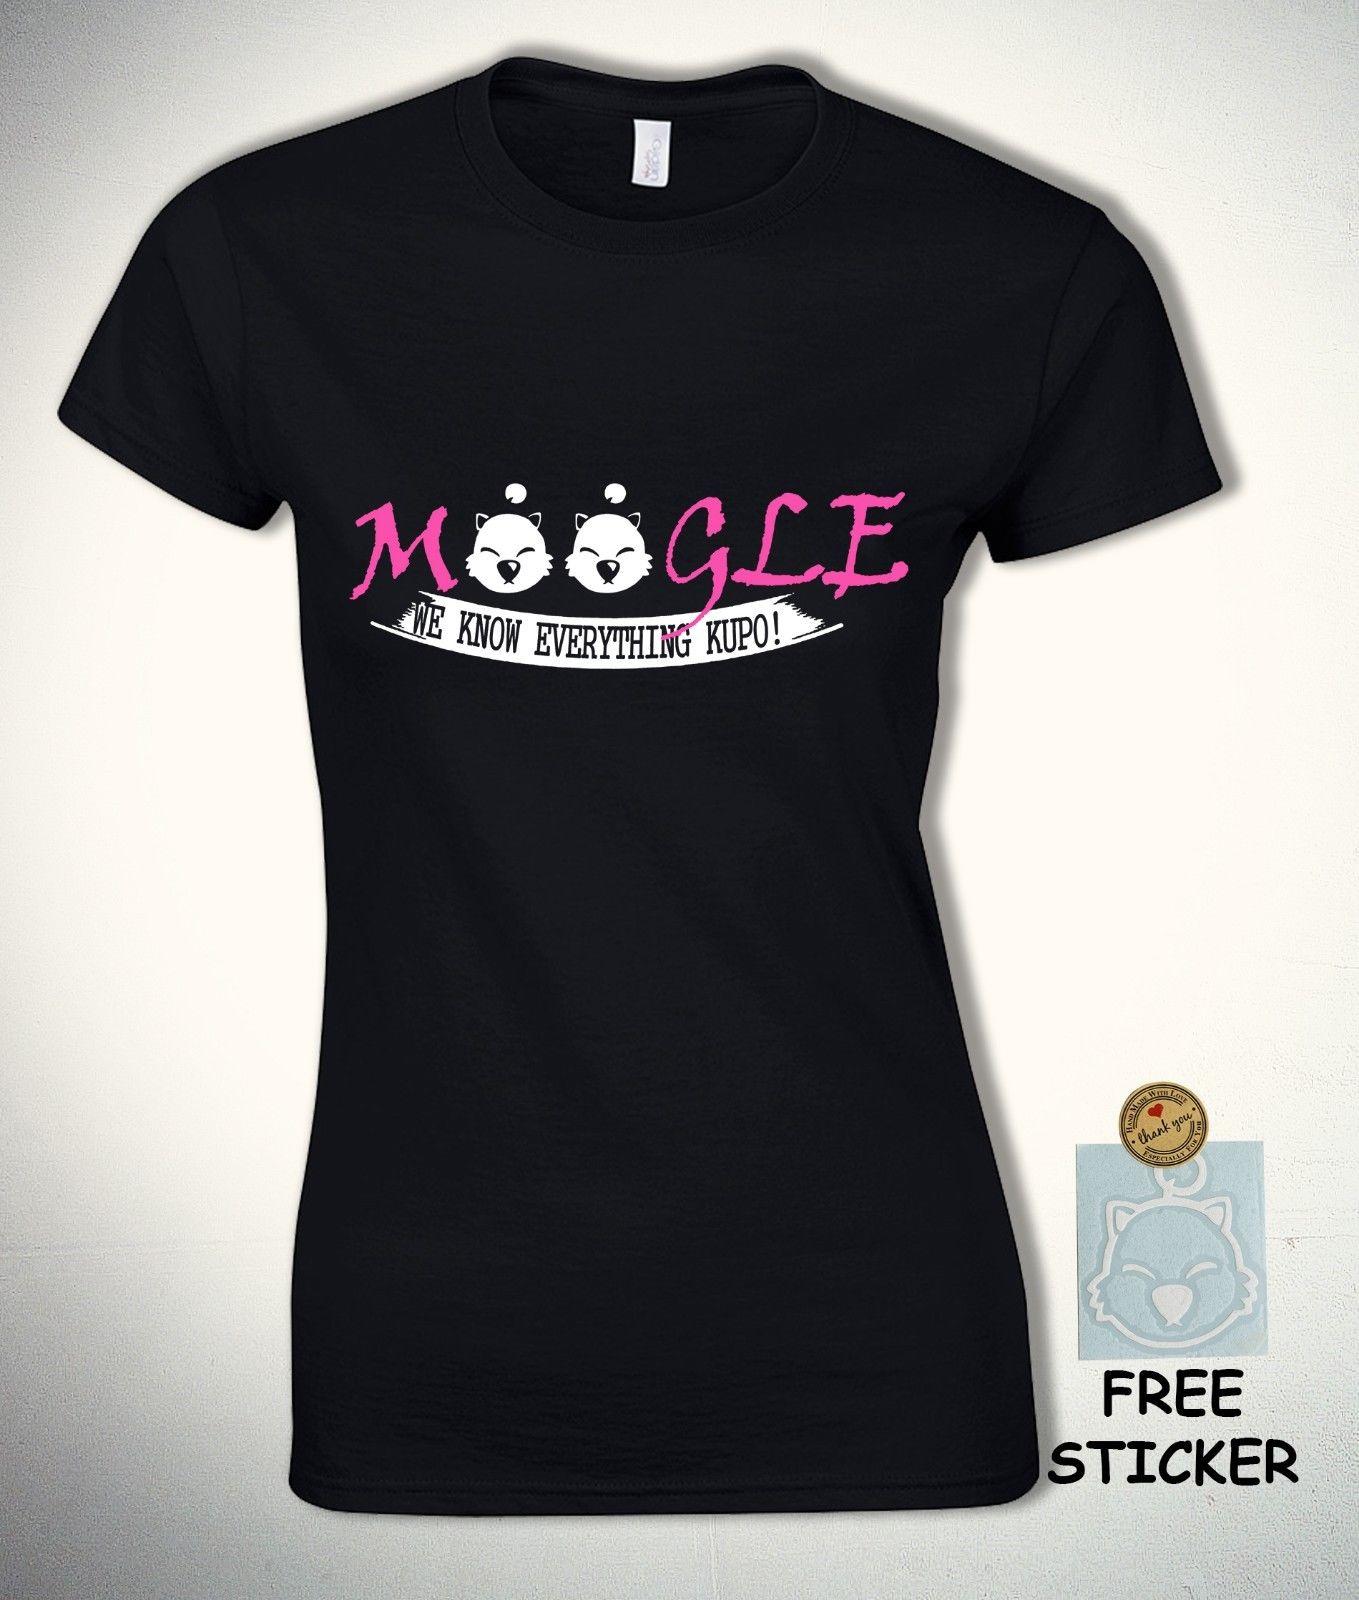 Final Fantasy camiseta Moogle We Know Everything divertida Kupo Tee 7 vii XV mujeres Cartoon camiseta hombres Unisex nueva moda camiseta